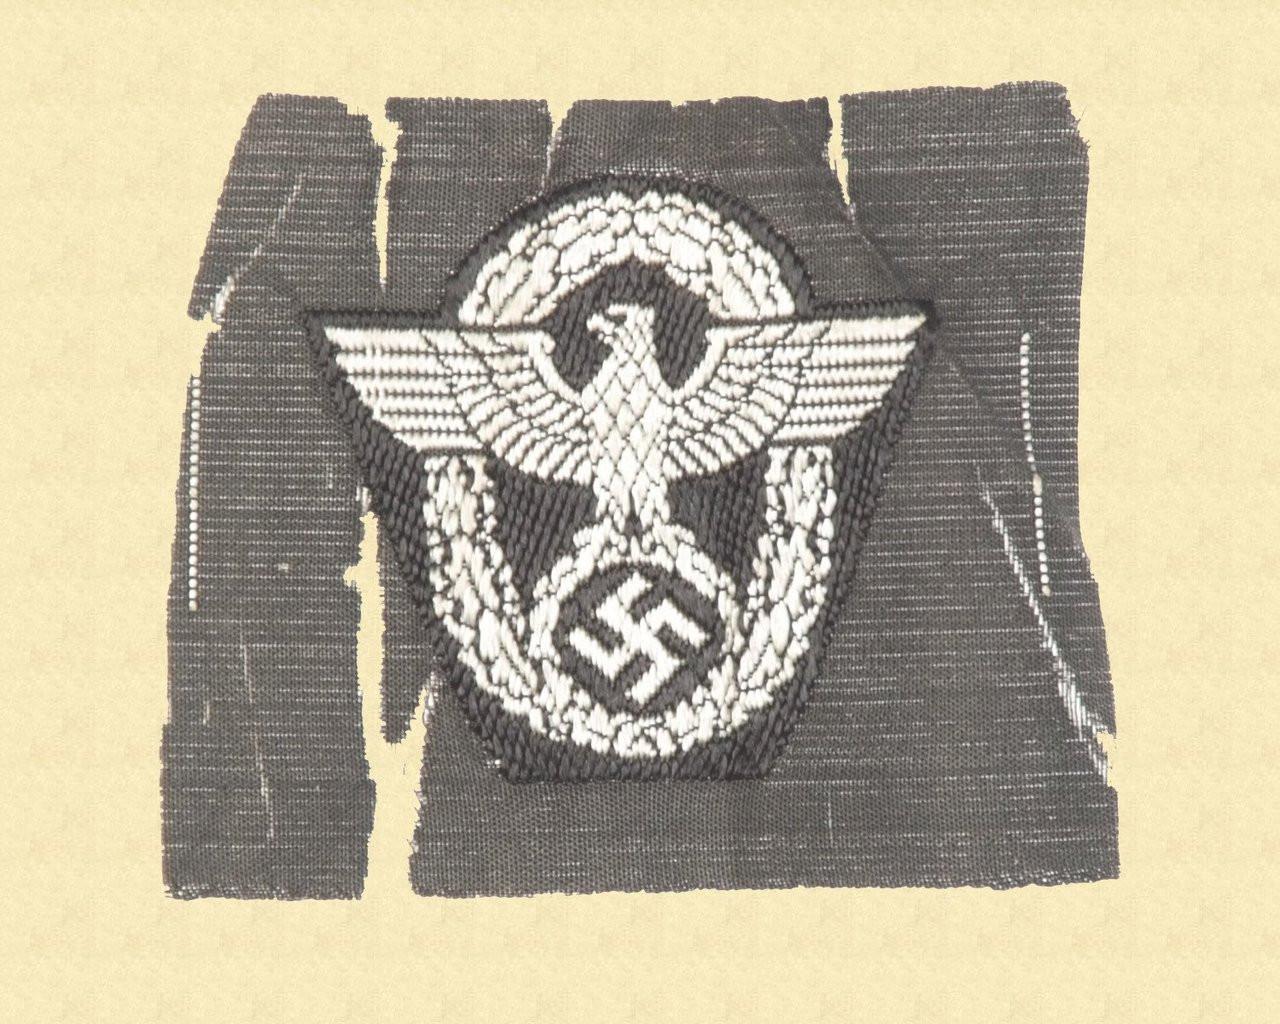 GERMAN POLICE EAGLE - C10790